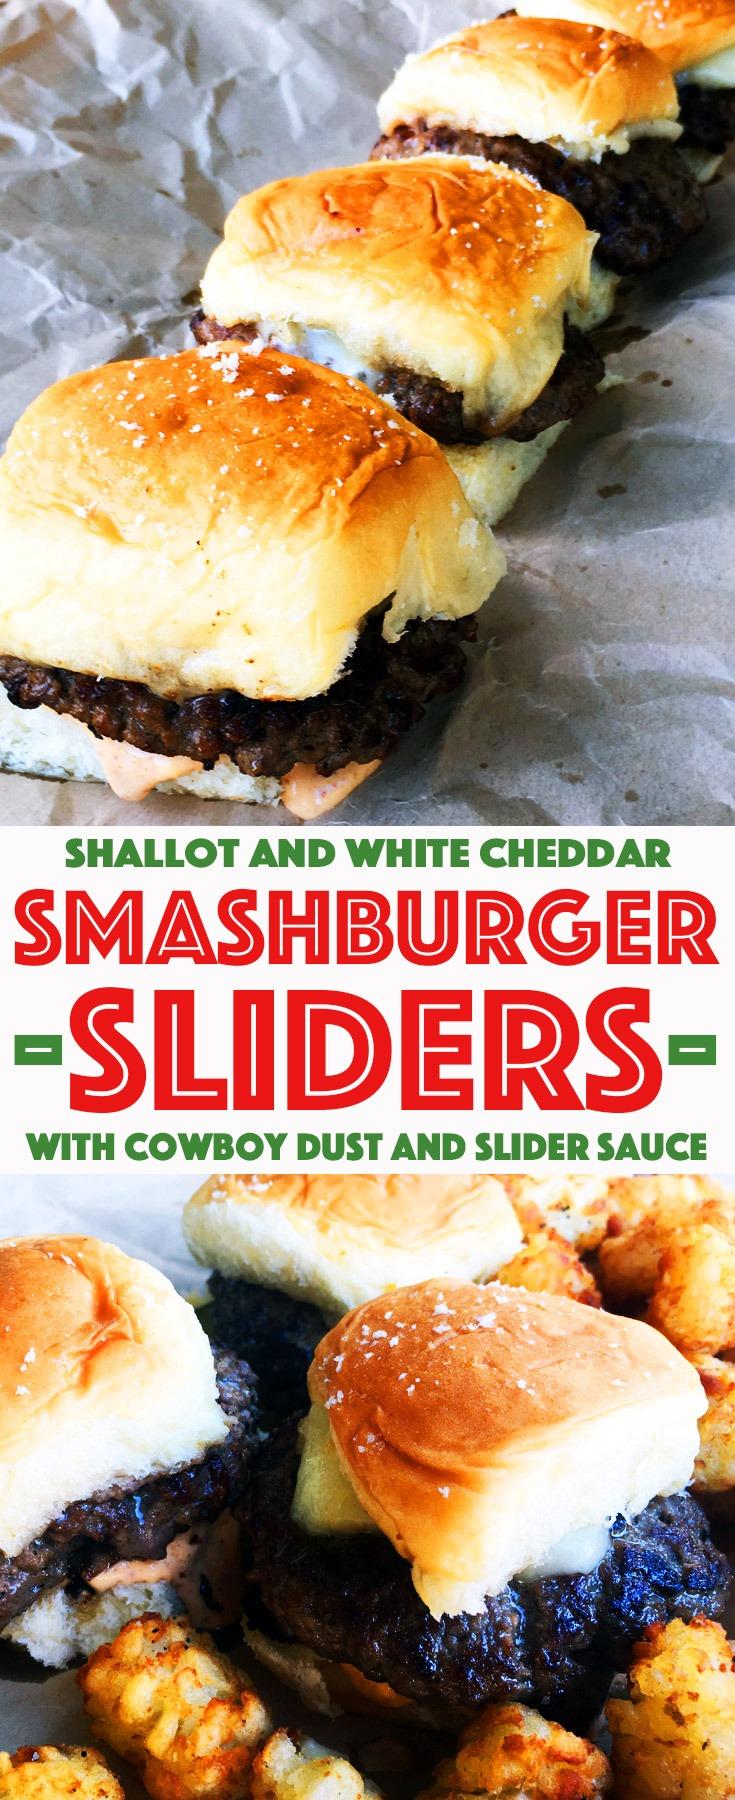 "Smashburger Sliders with title ""Shallot and White Cheddar Smashburger Sliders with Cowboy Dust and Slider Sauce."""